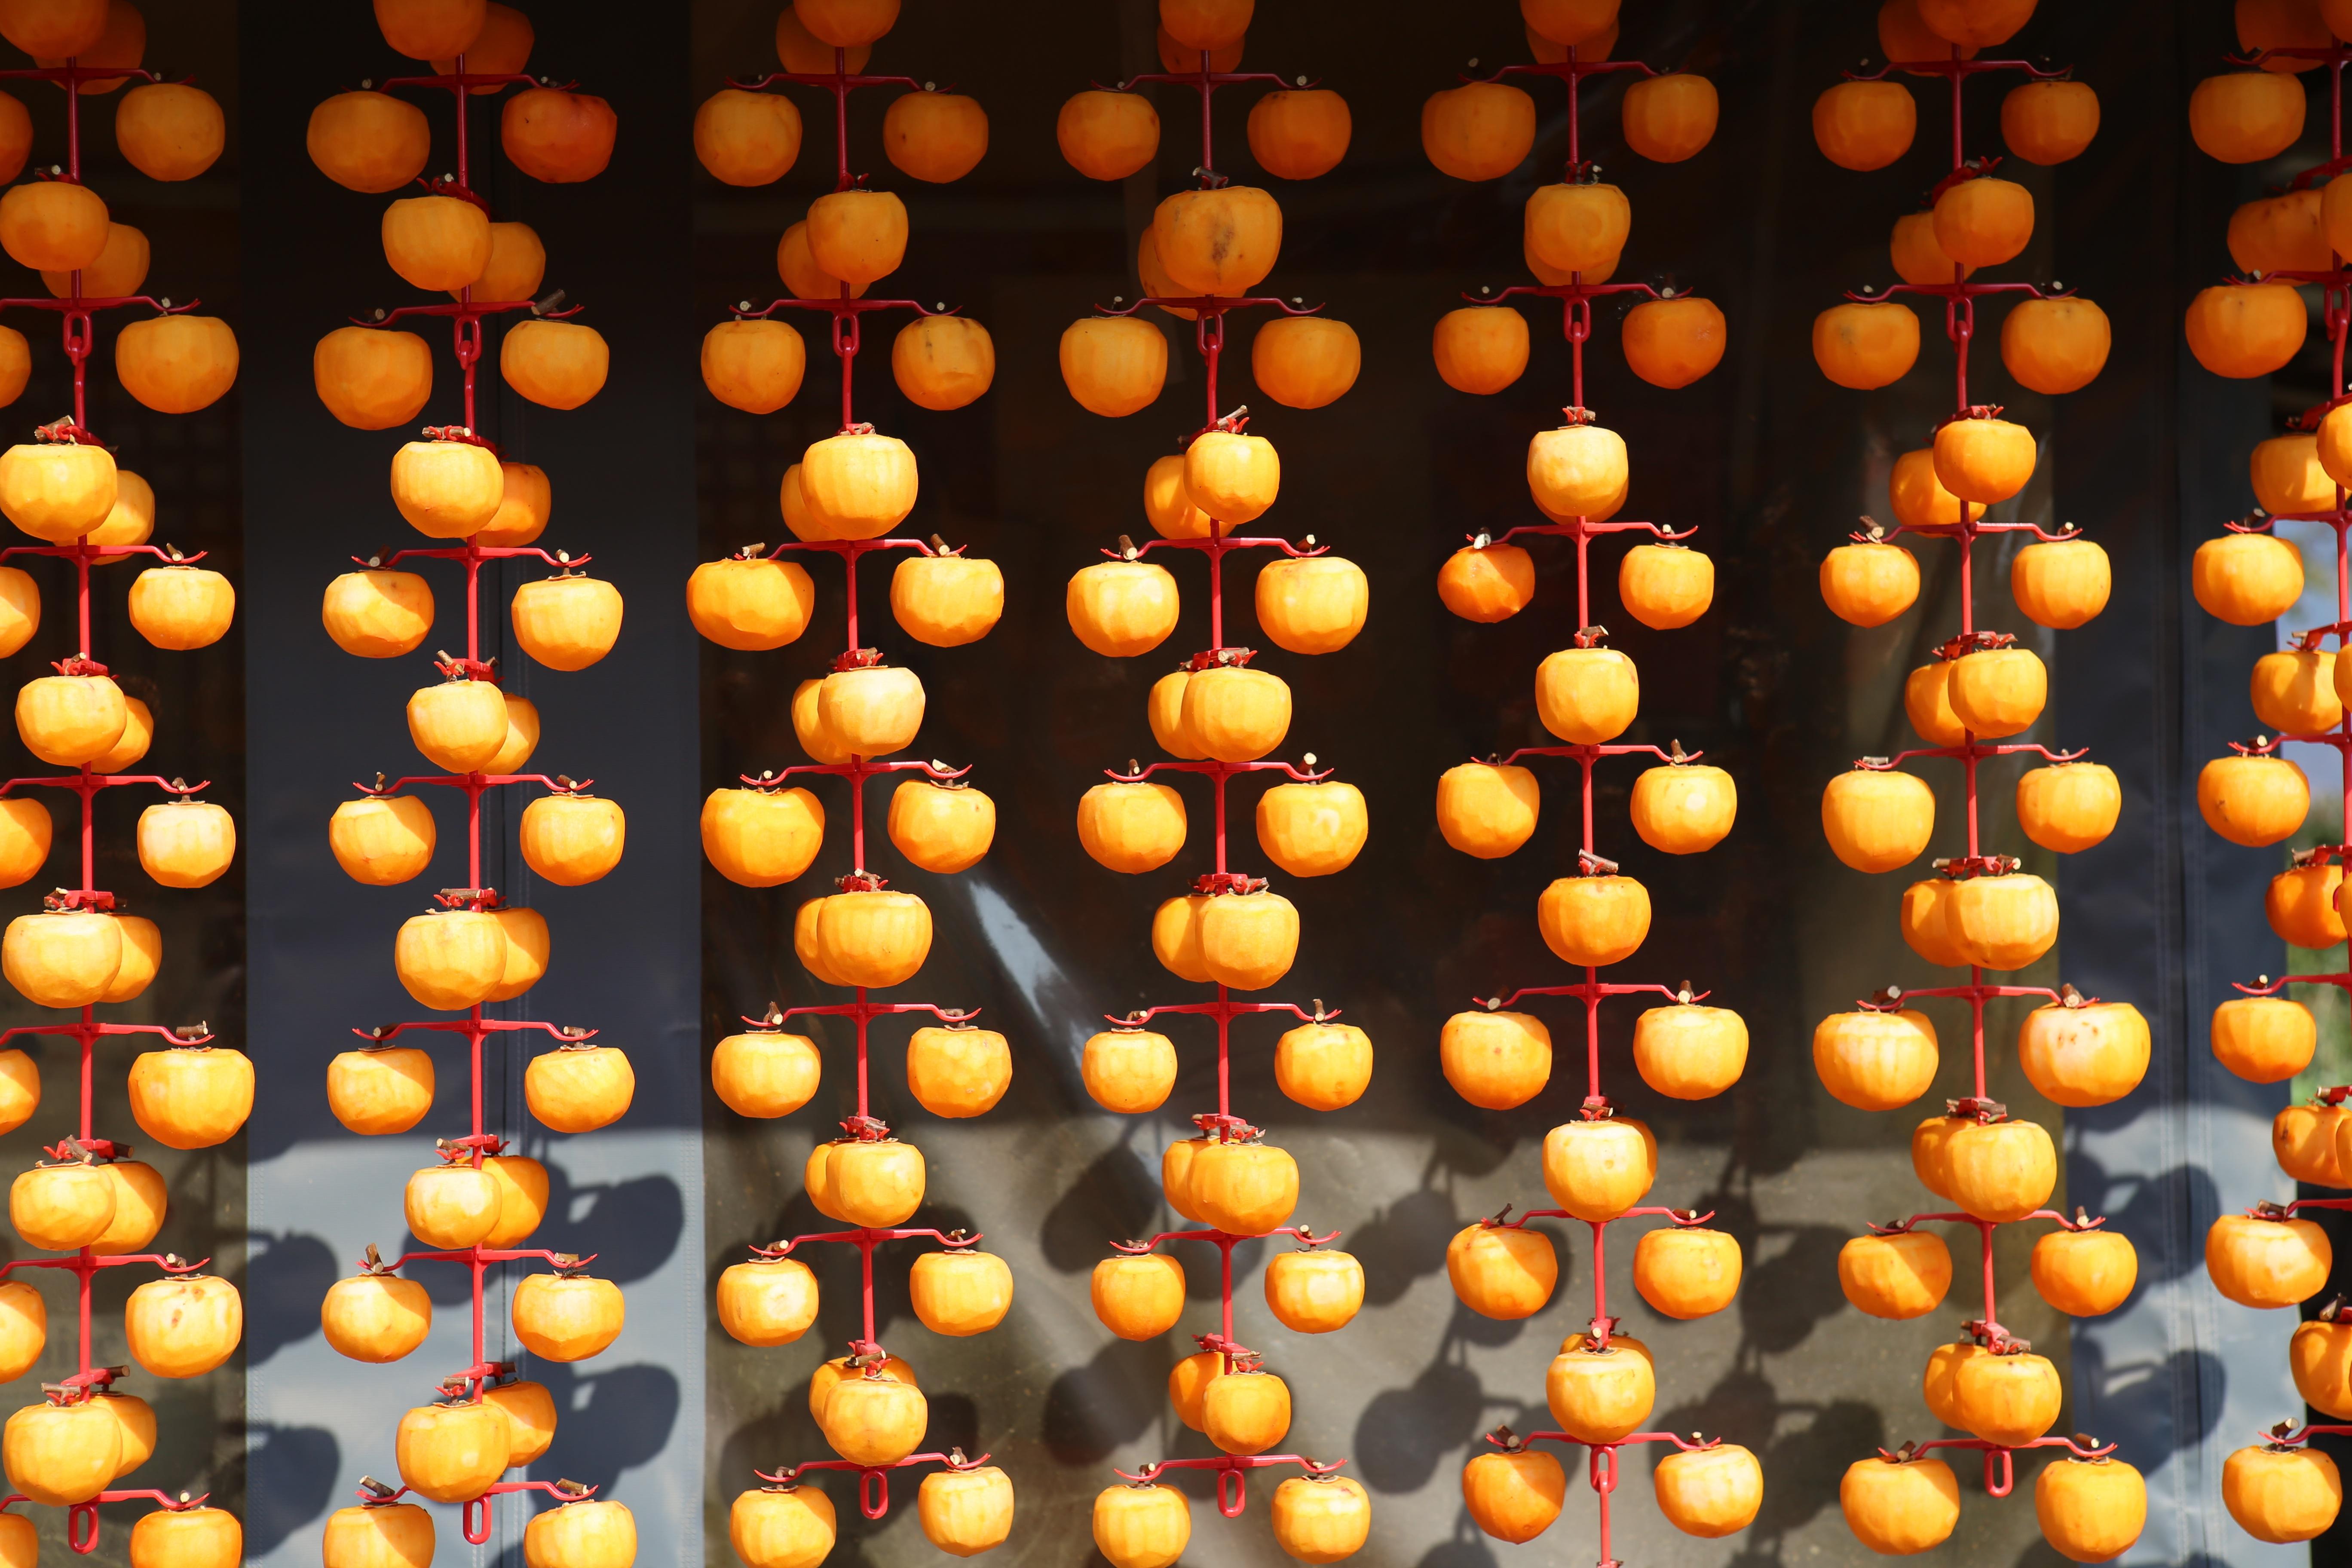 fruit orange pattern yellow font persimmon dried persimmon computer wallpaper hahoe village 1373547